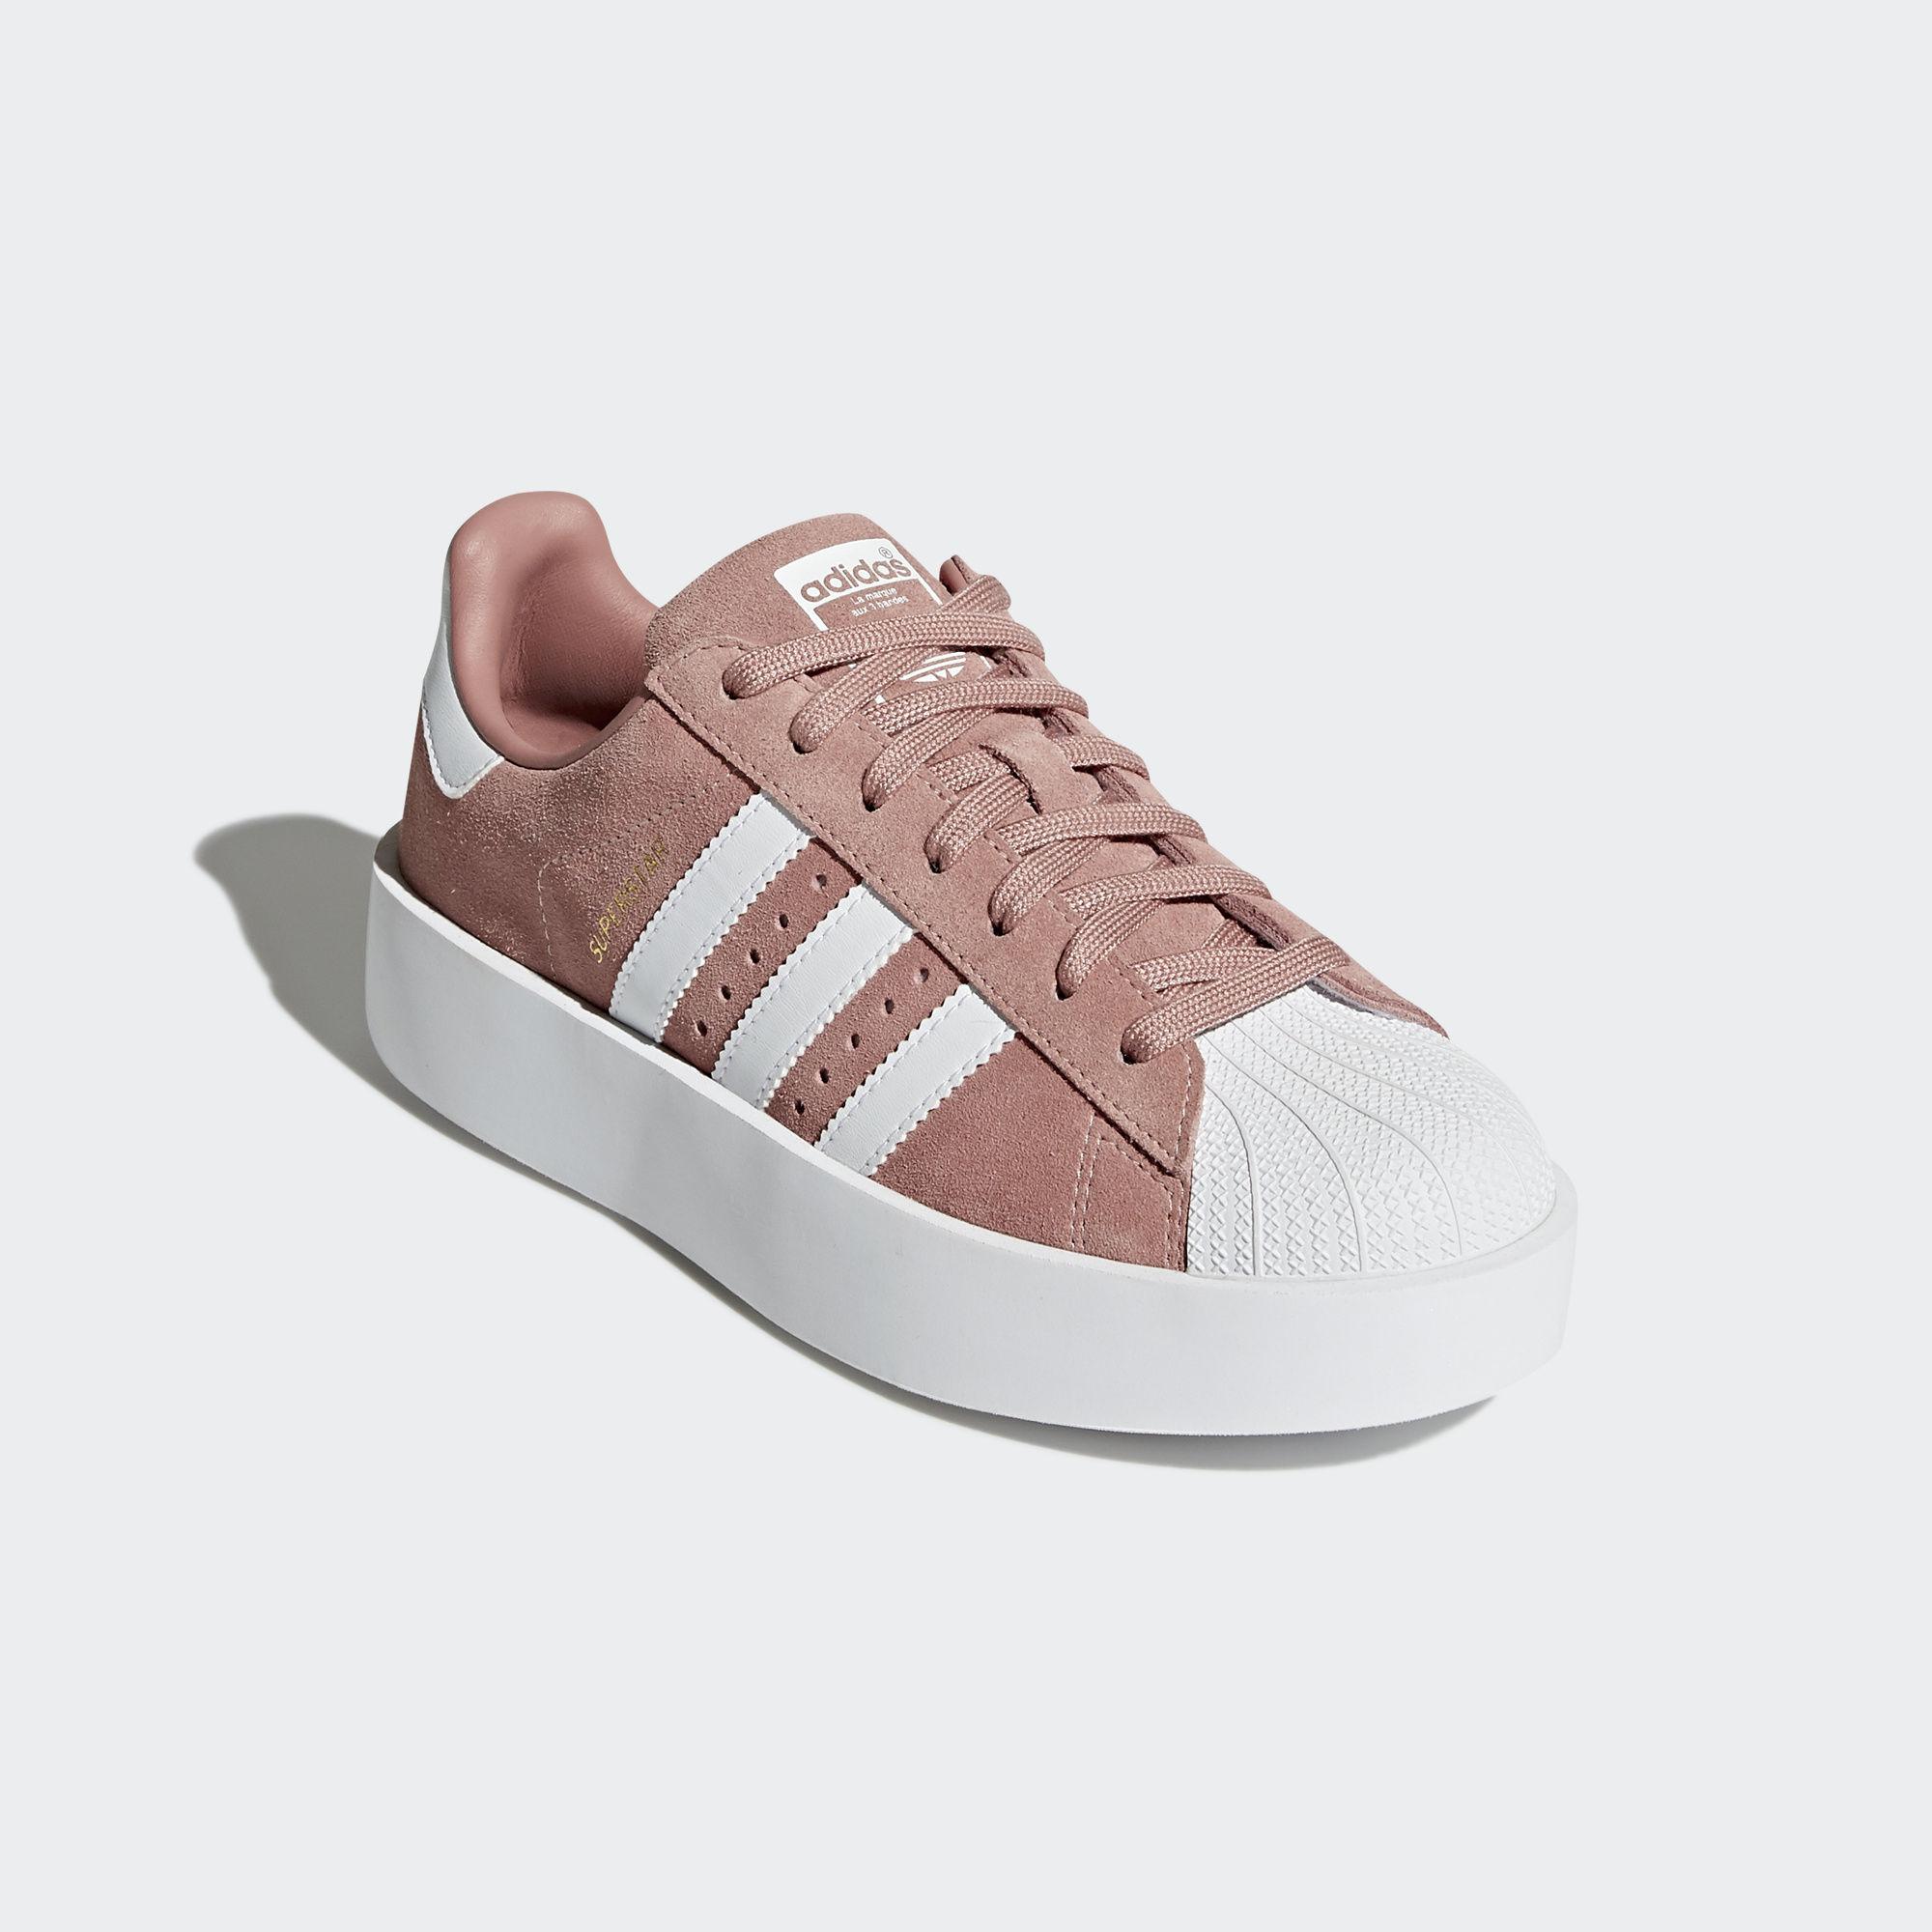 Scarpe Adidas Superstar Bold Platform Zeppa Donna Camoscio Rosa Pink Sneakers Art. CQ2827 - colbaffo